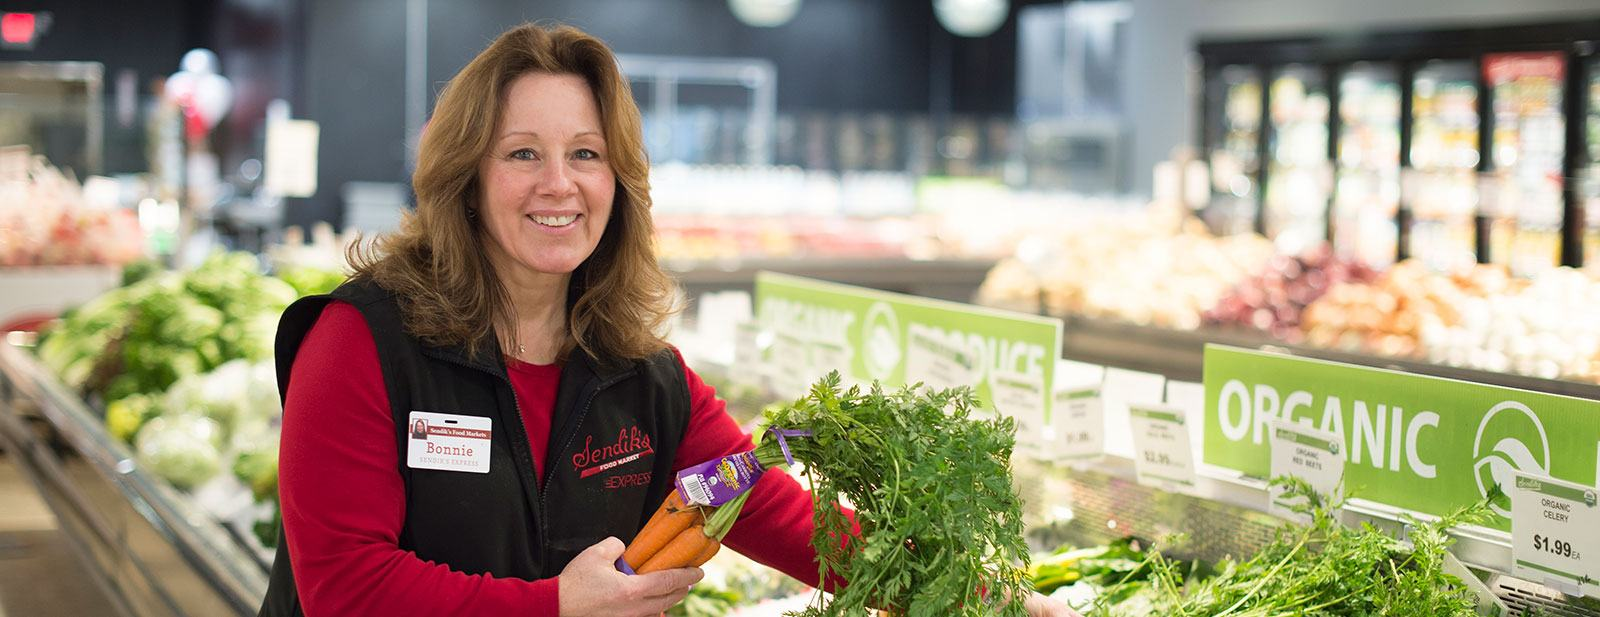 Sendik's Personal Shopper Bonnie in Produce Department